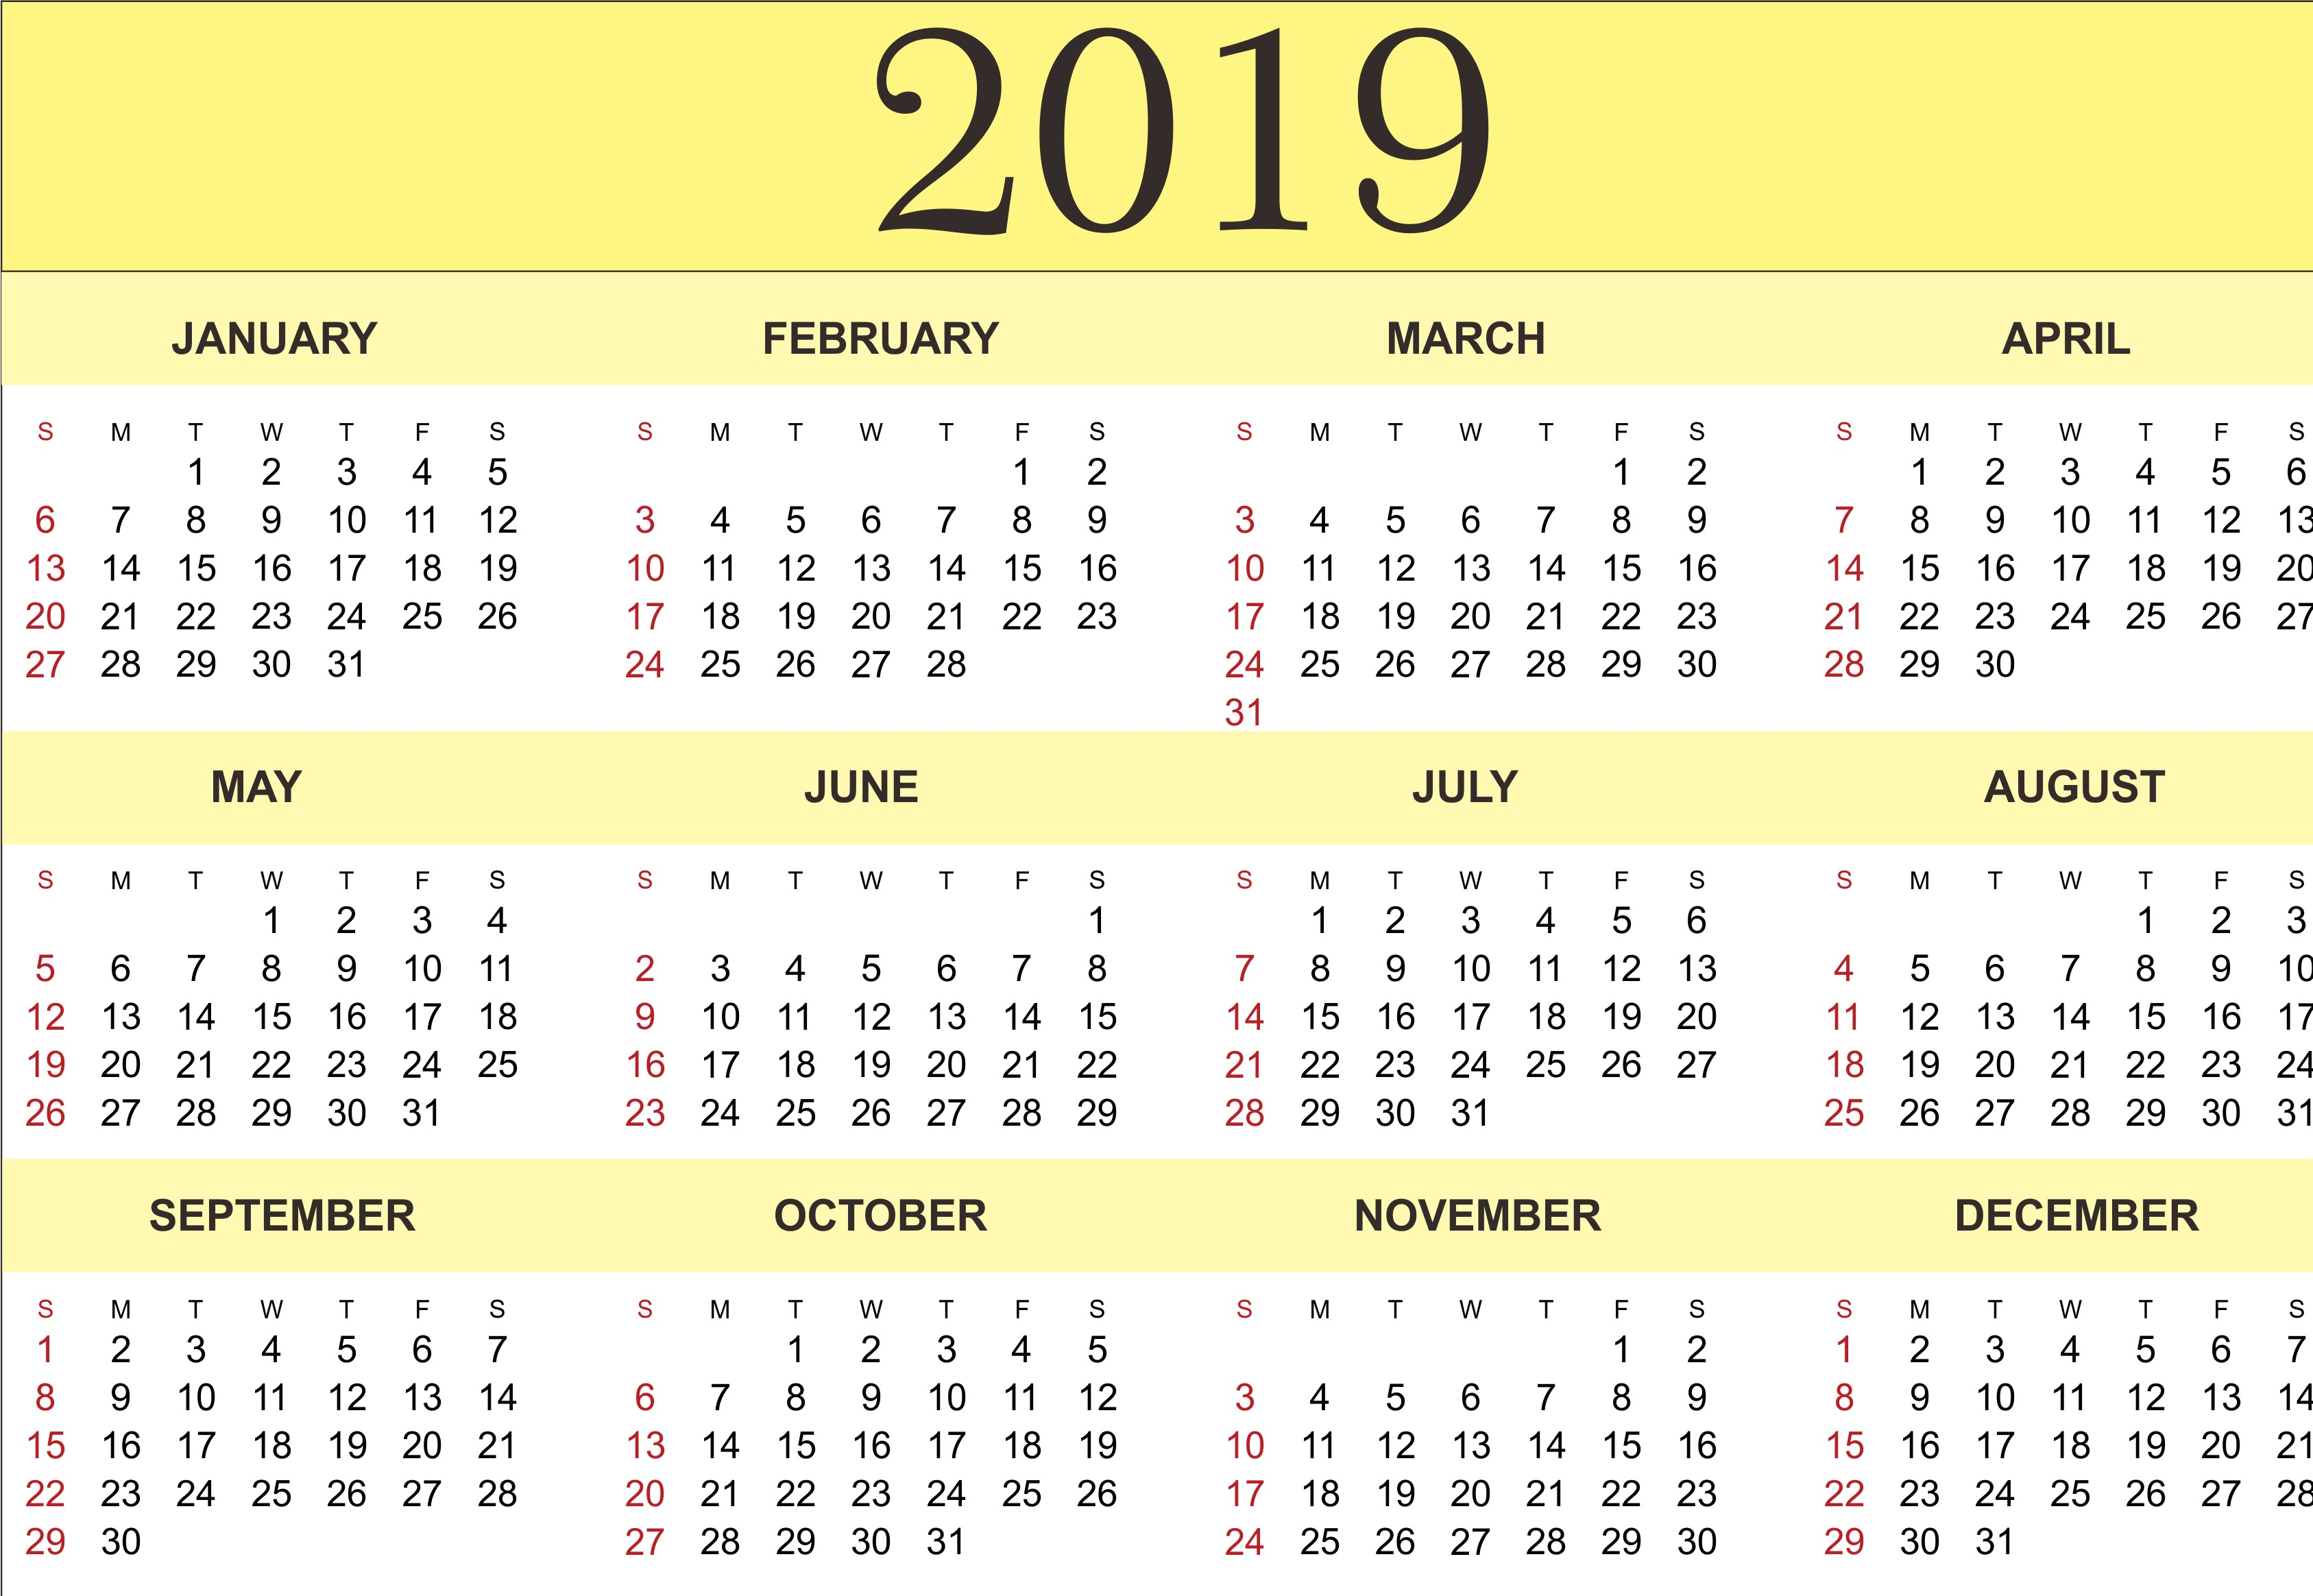 2019 Calendar with Holidays Printable 2019 Printable Calendar Templates Pdf Excel Word Free